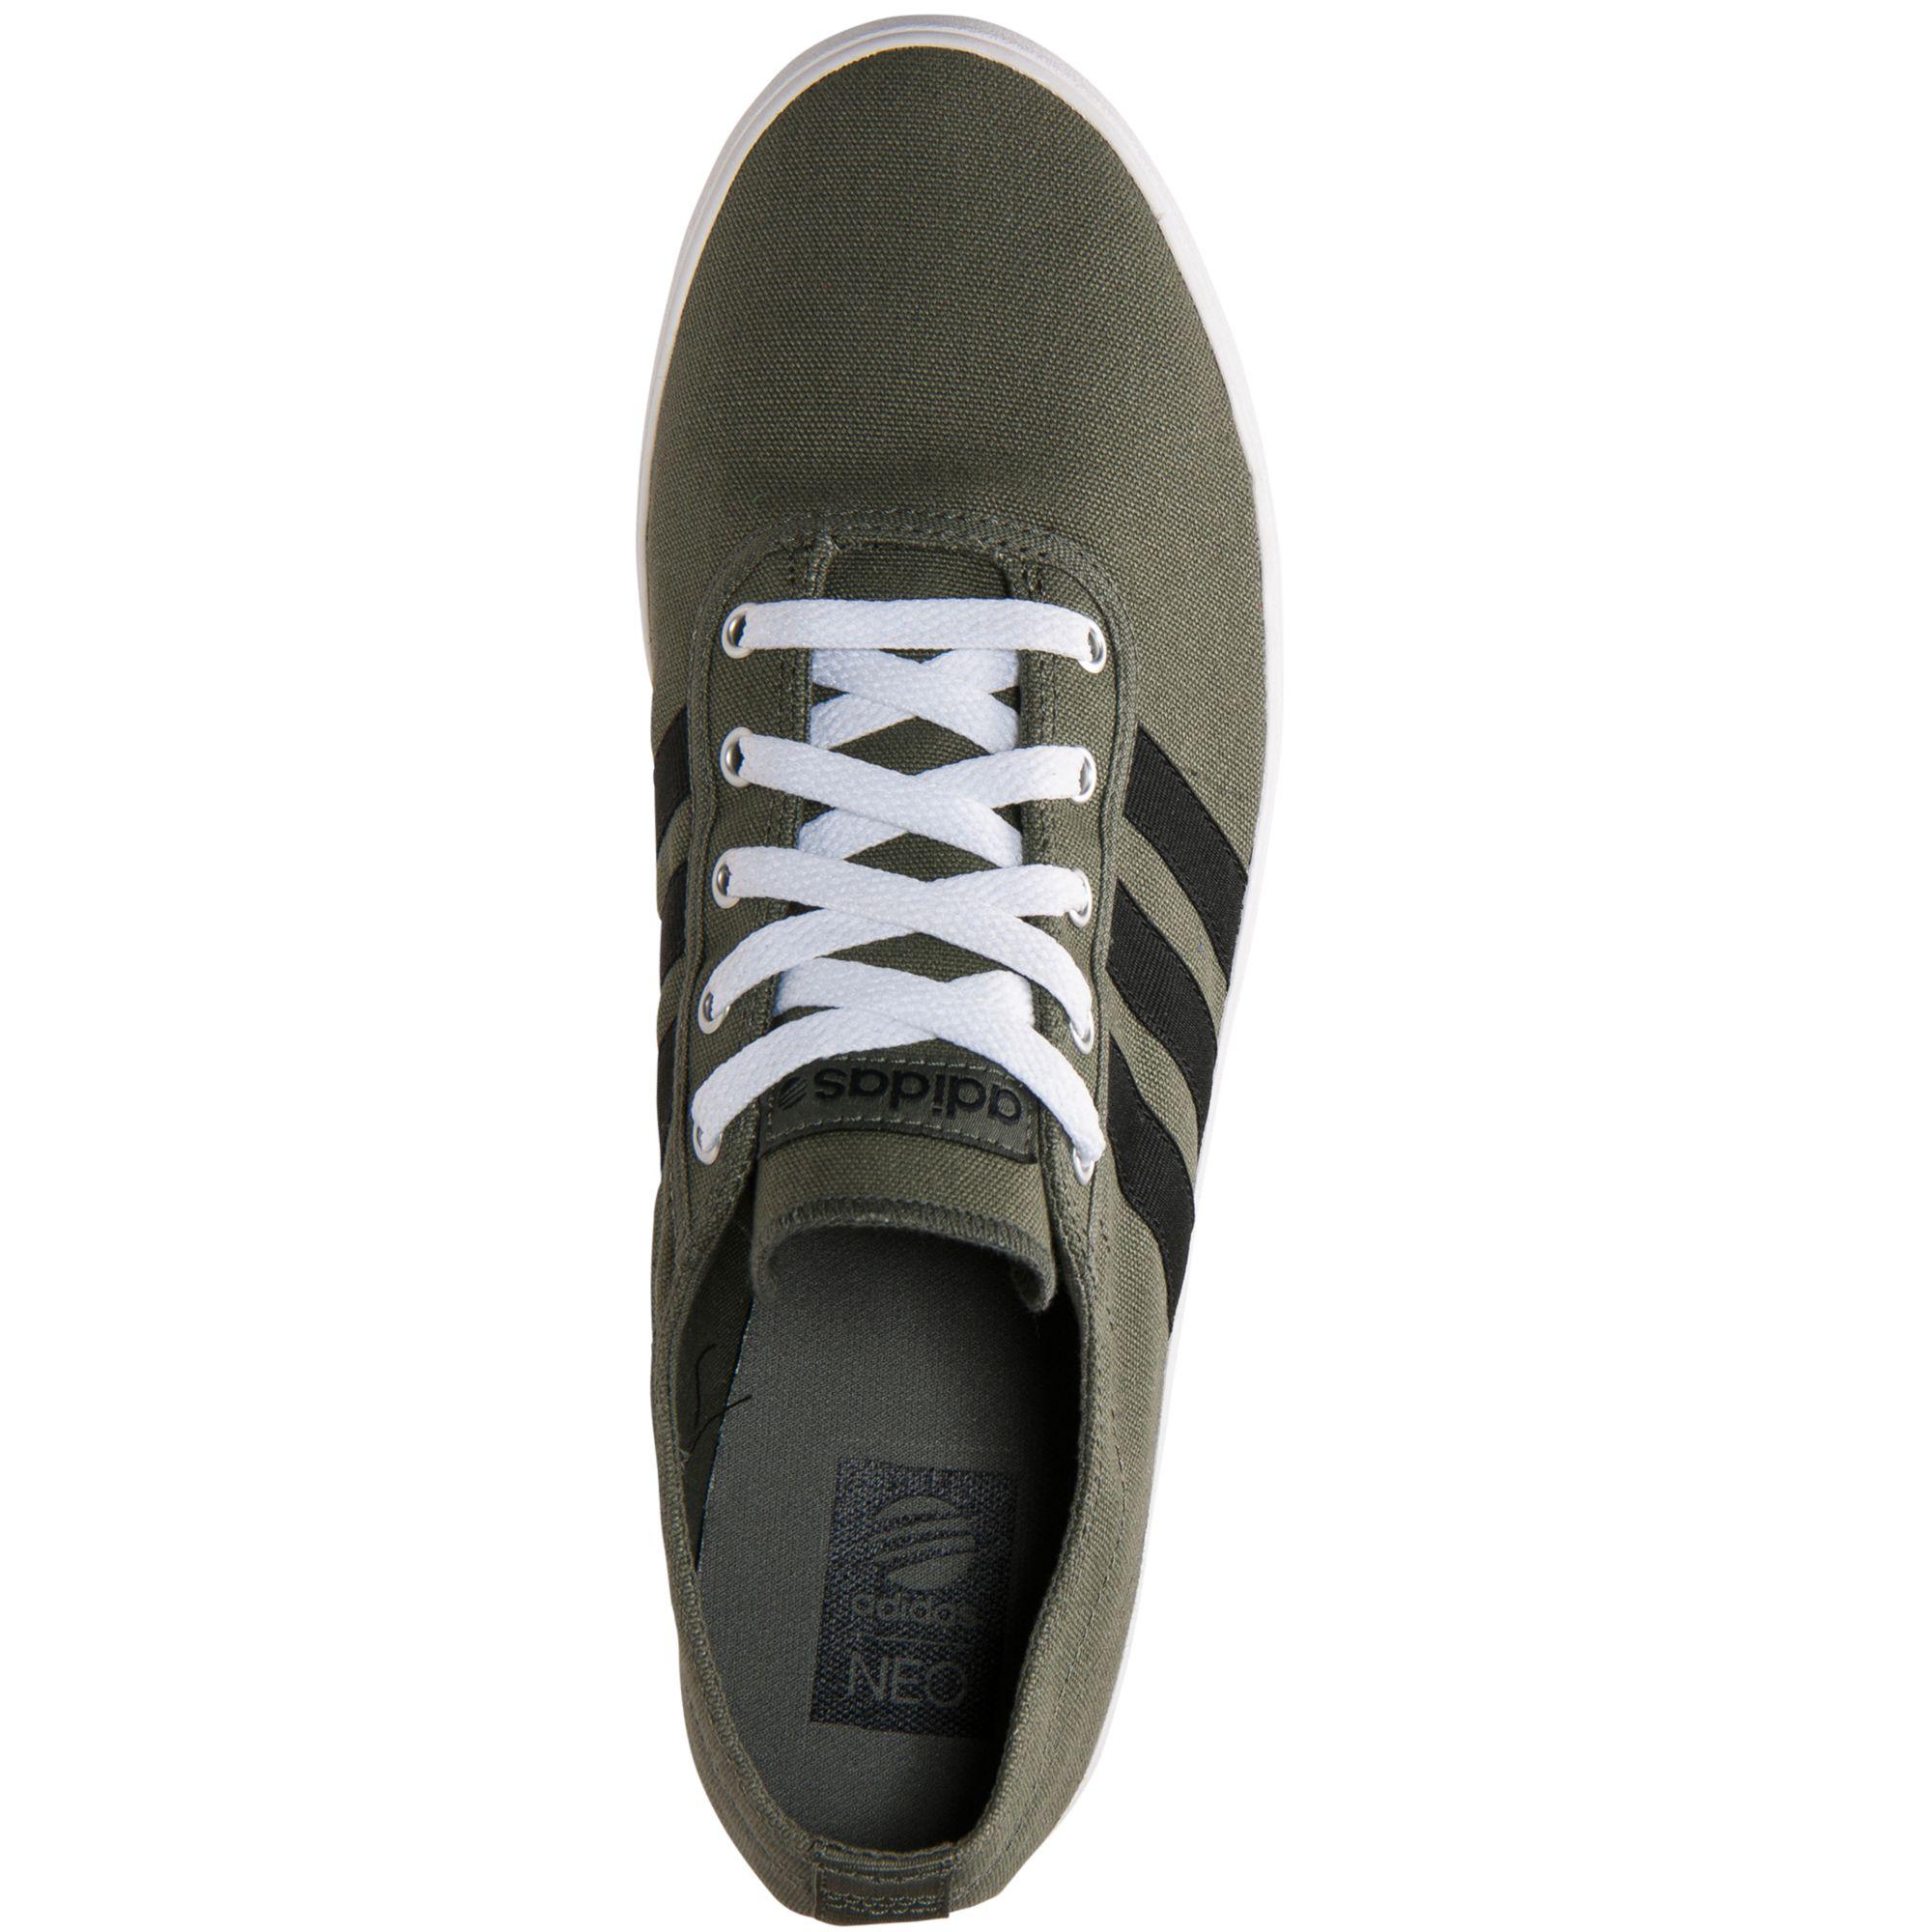 Adidas Men'S Neo Easy Vulc Ad Shoe Dark Green Black In